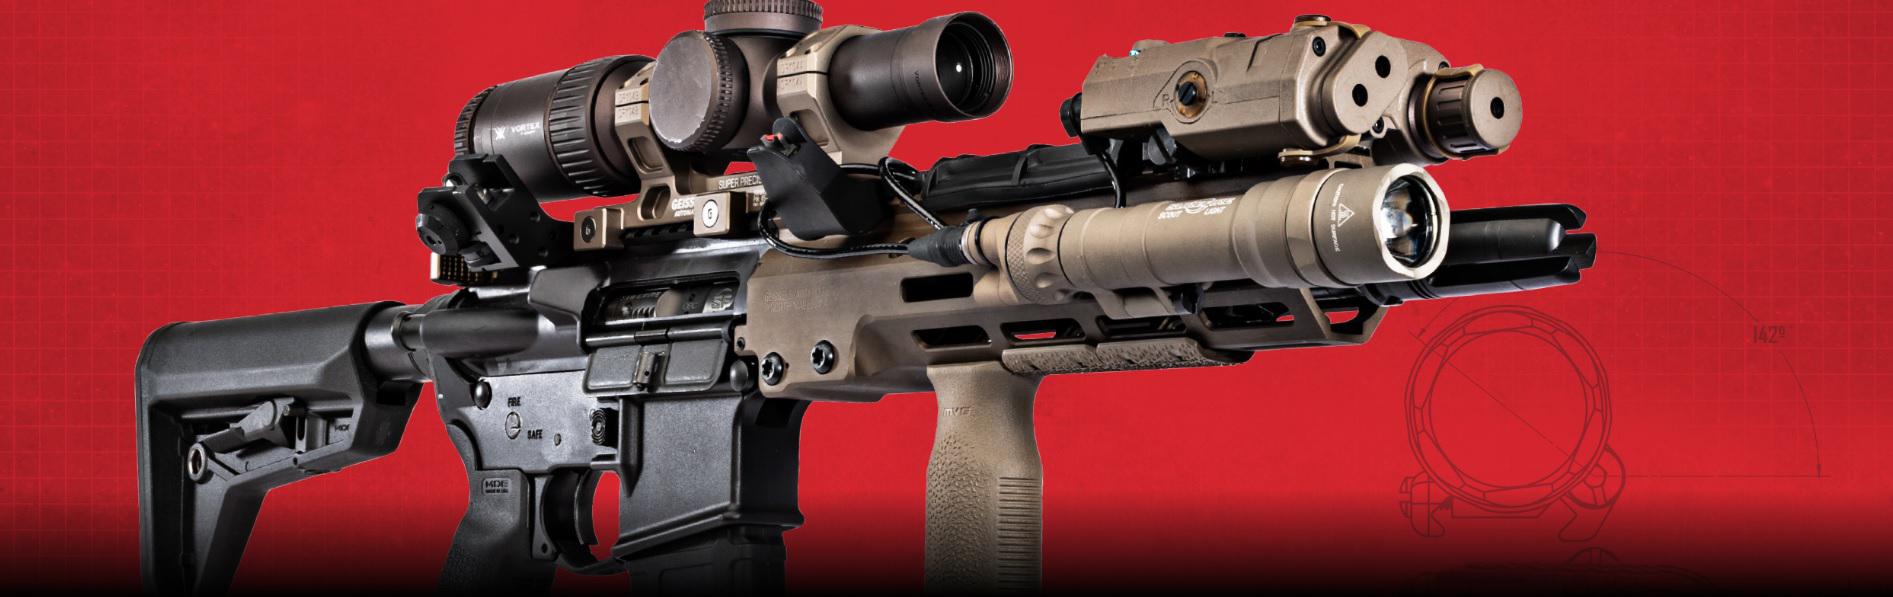 SUREFIRE-M340V-PRO-MINI-INFRARED-SCOUT-LIGHT